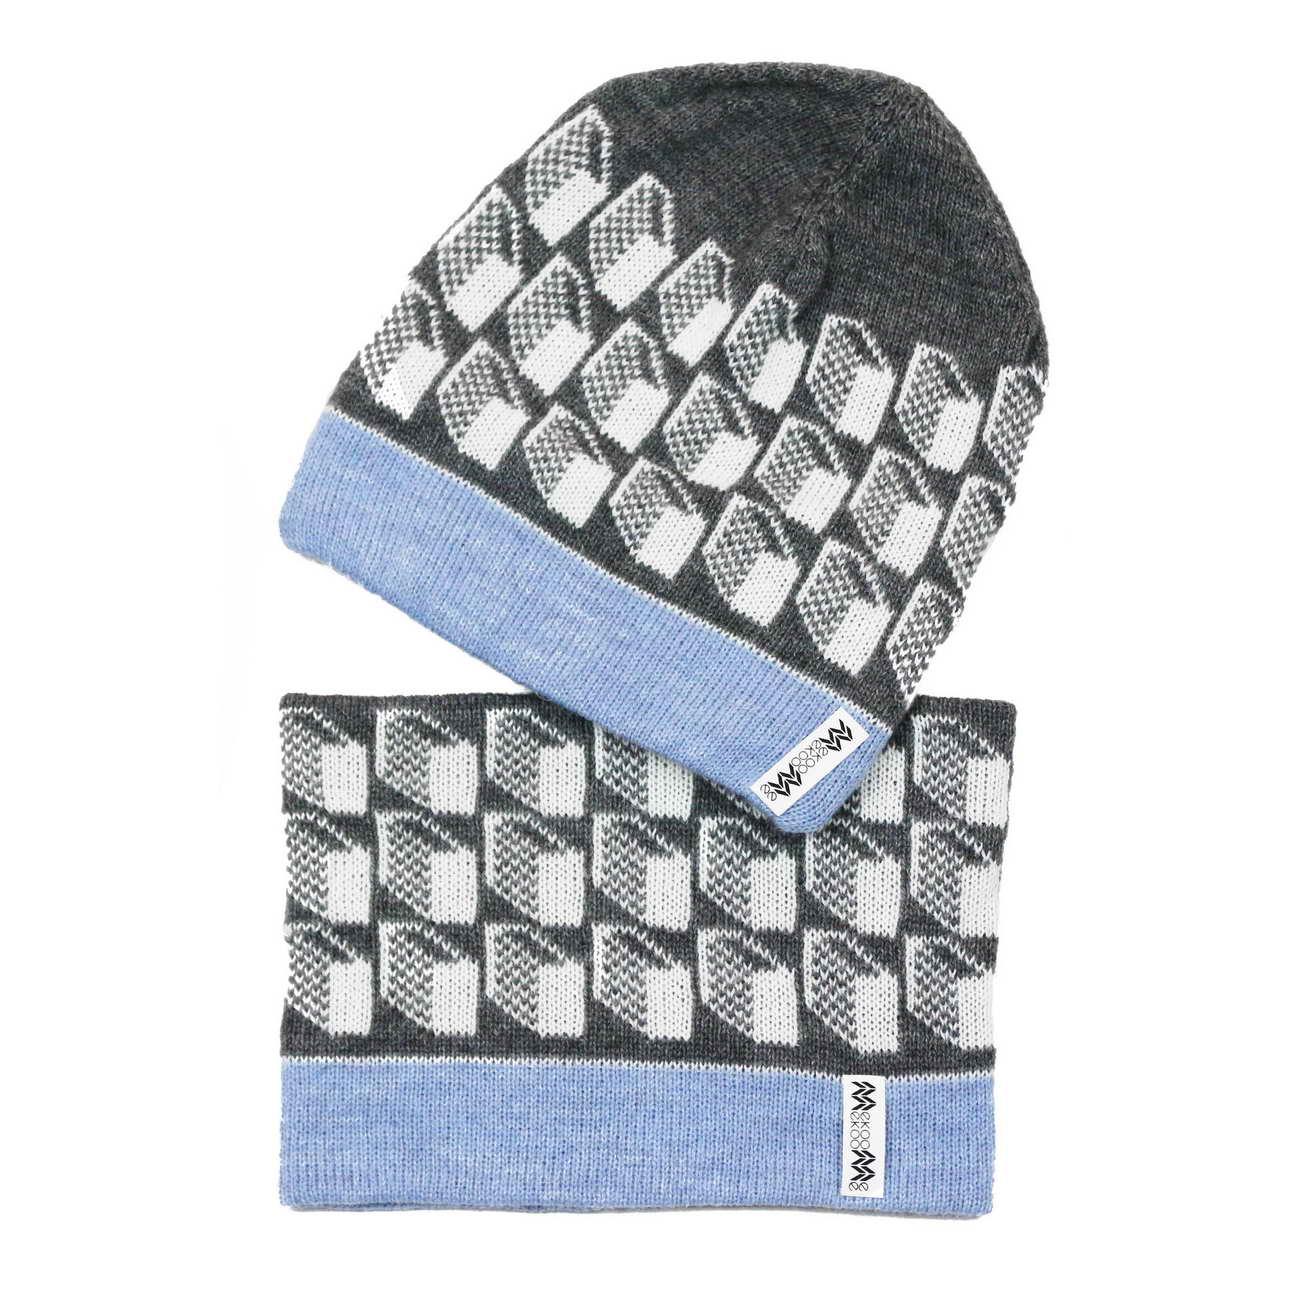 hatsnood Lasna gray top pale blue inside